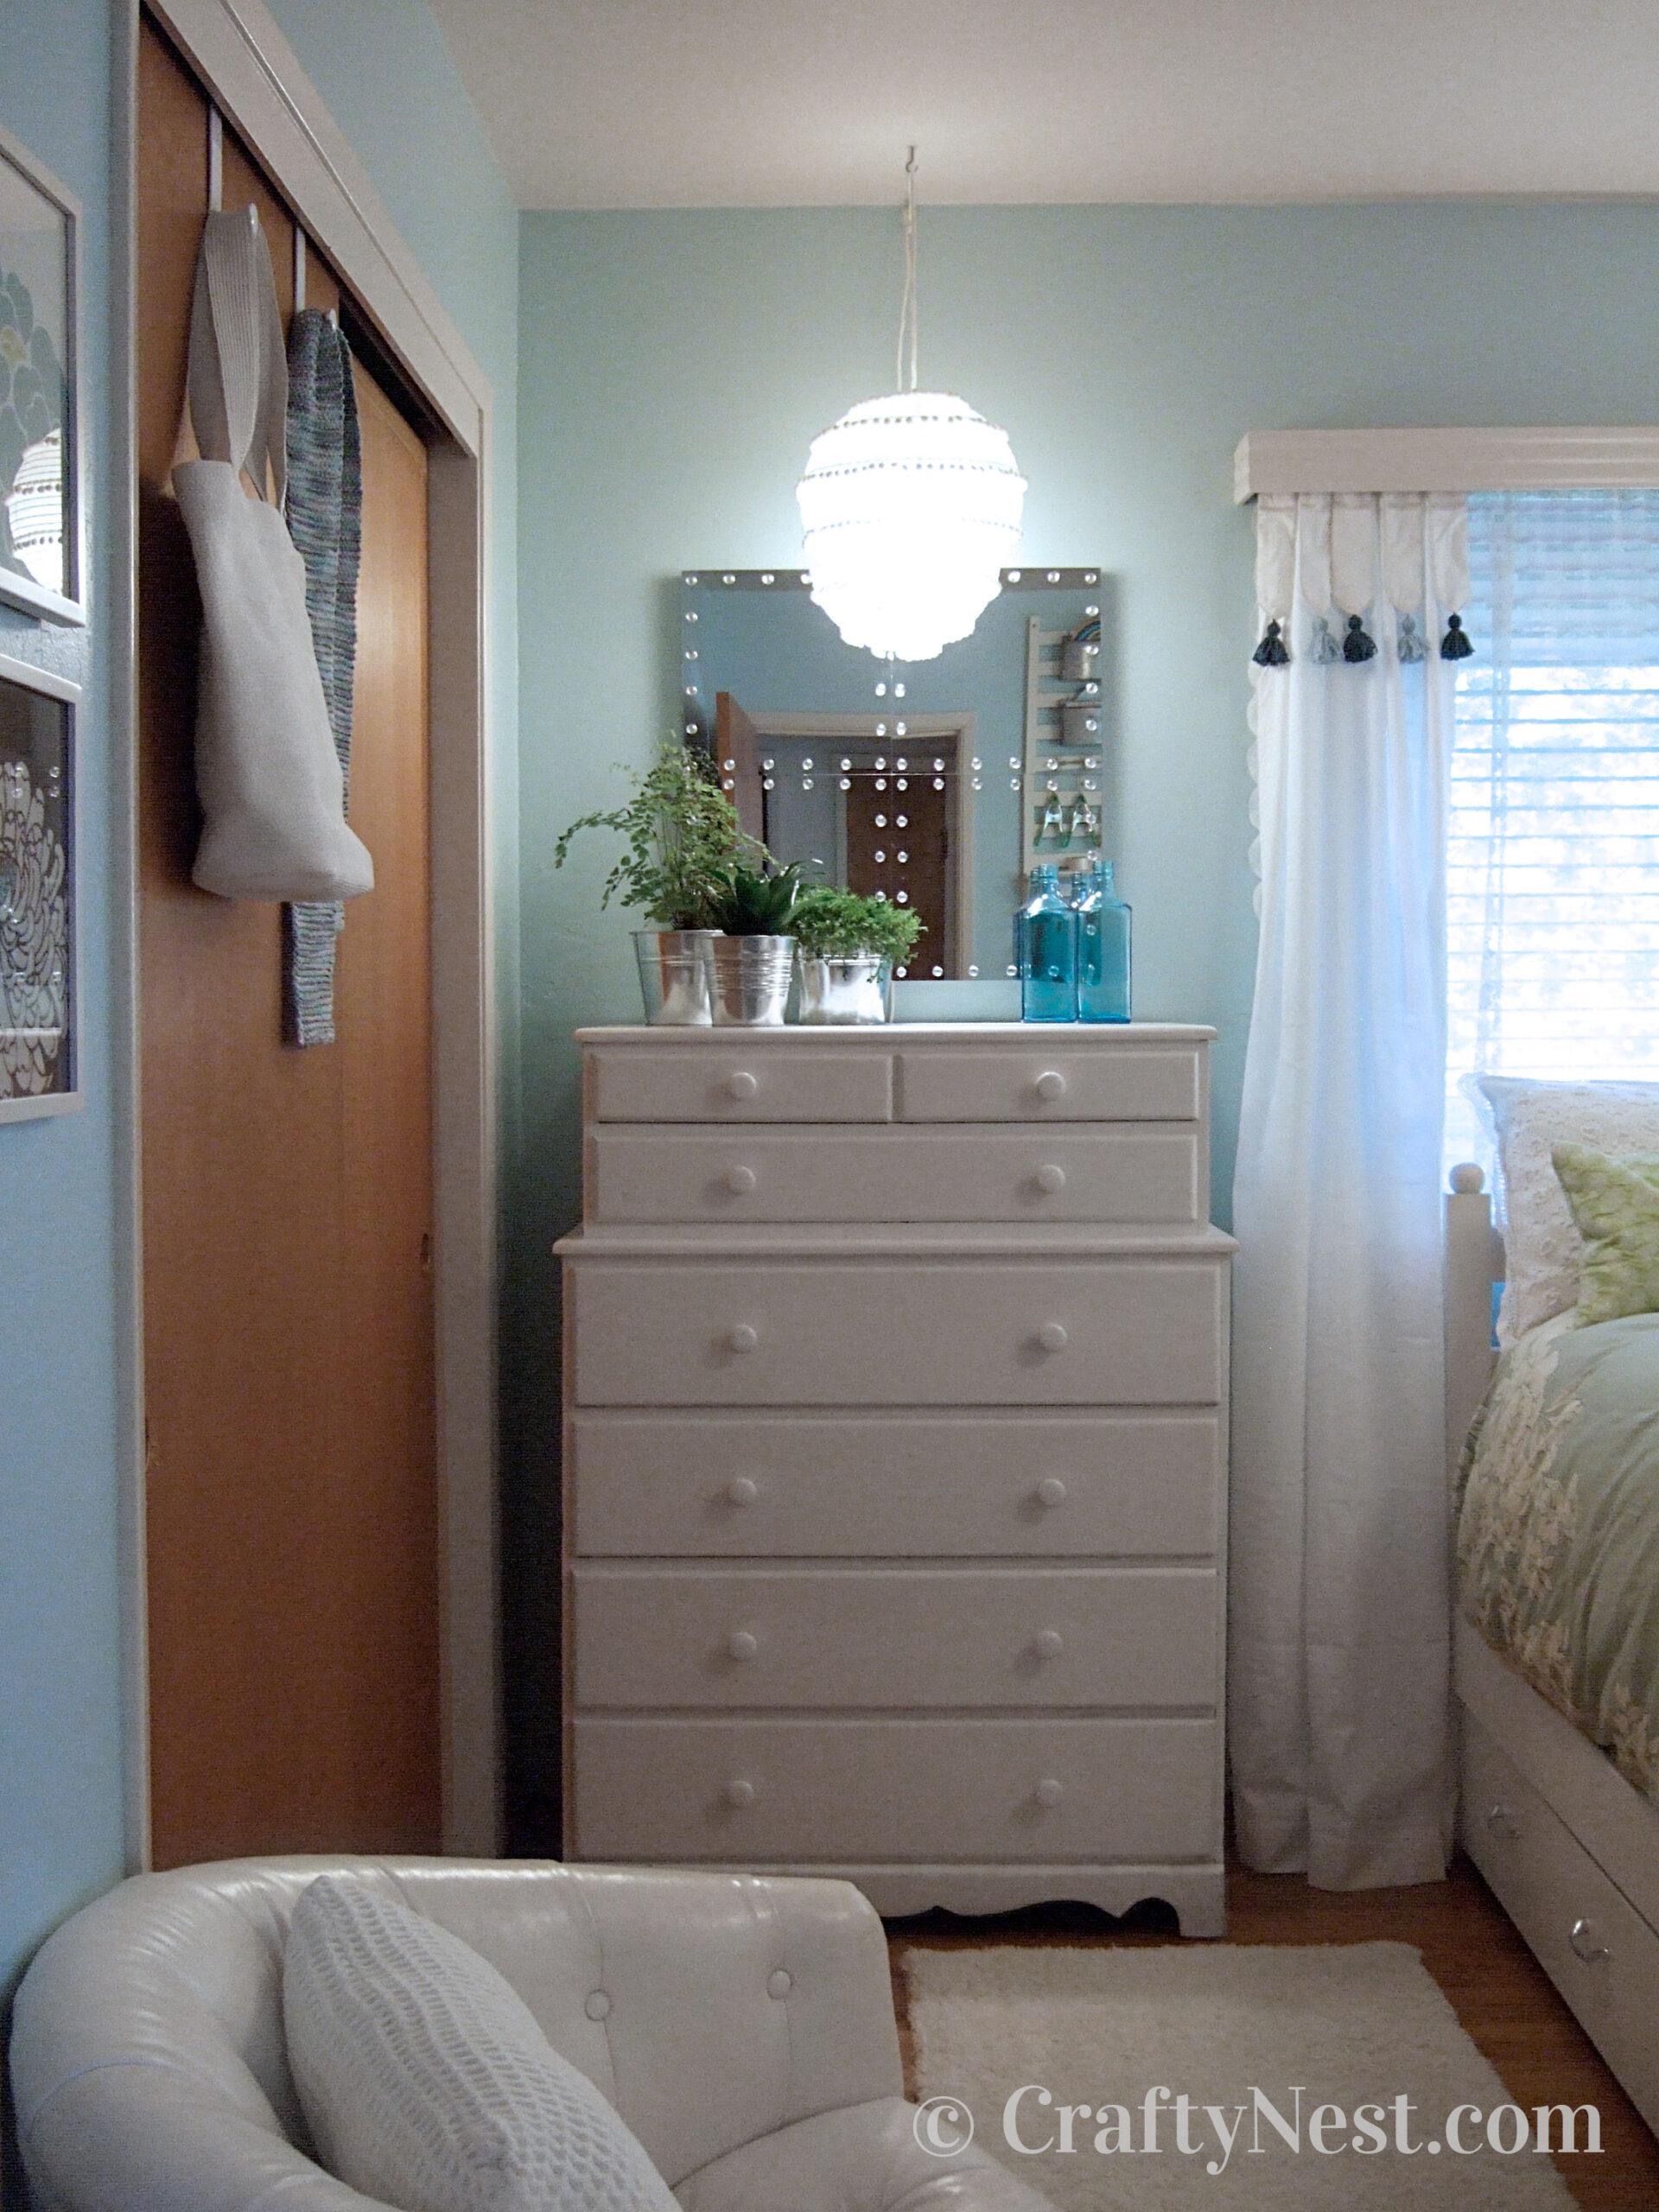 Dresser and mirror, photo